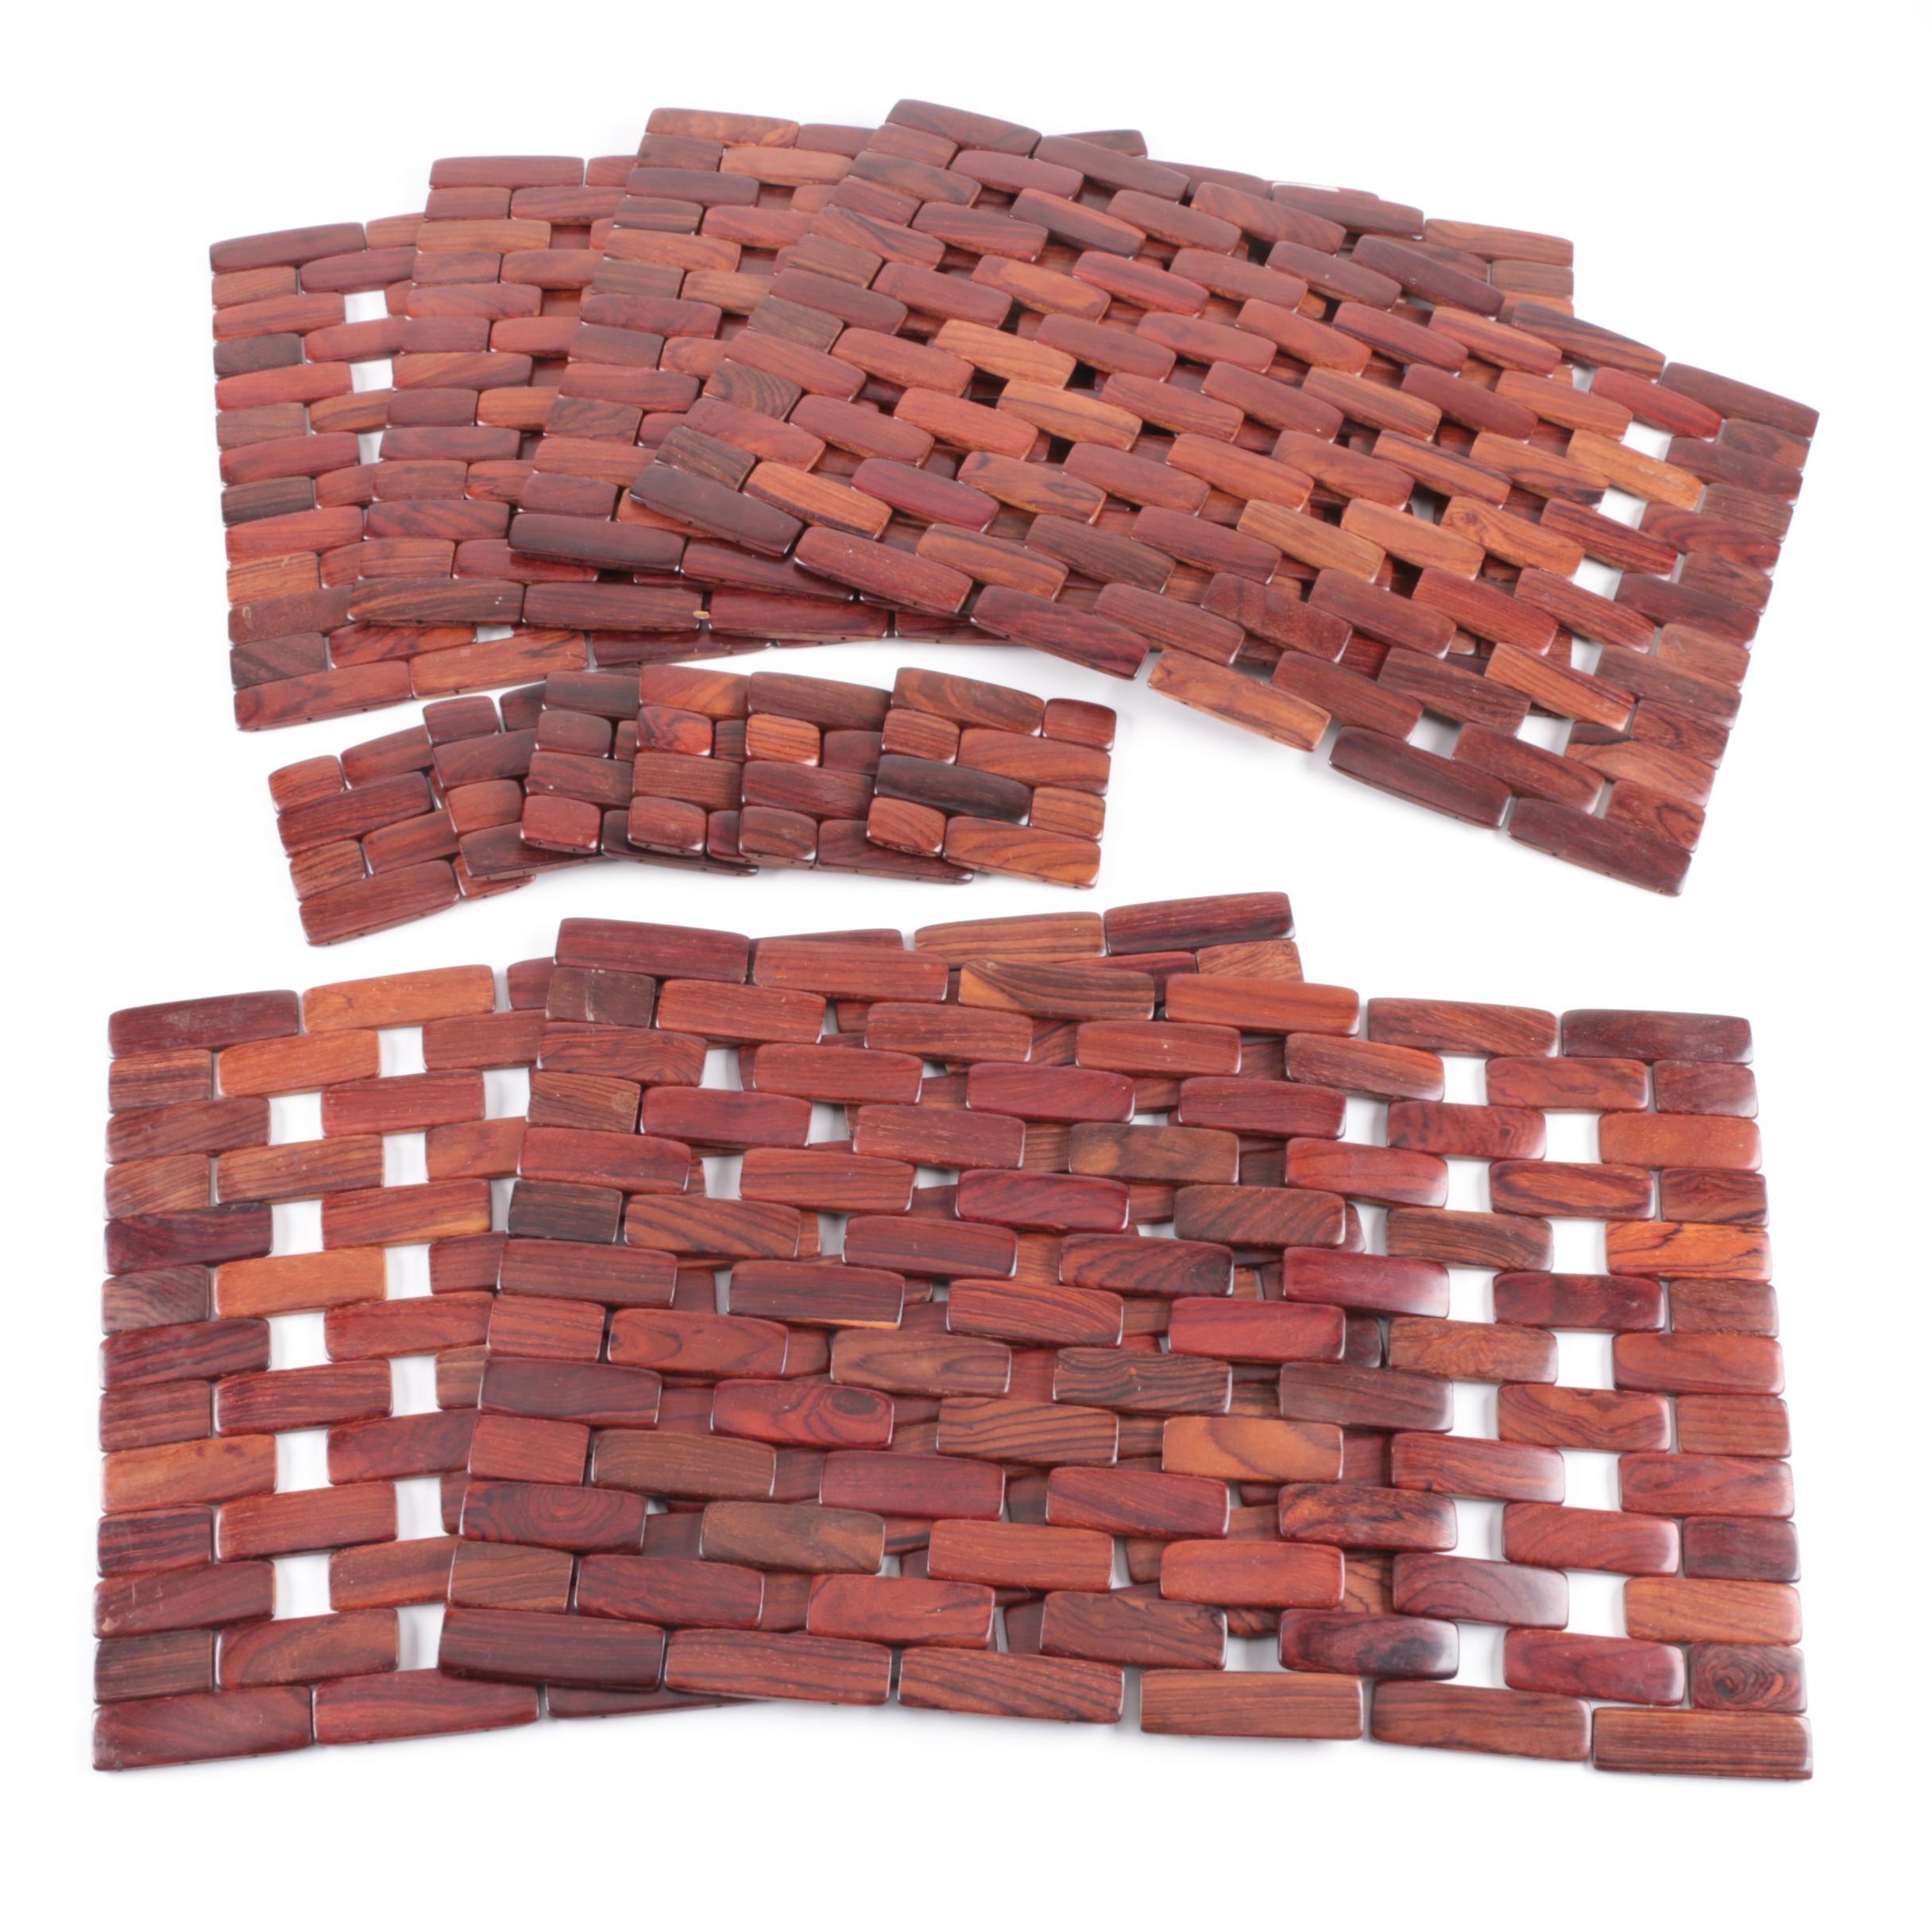 Wood Paneled Wall Decorations